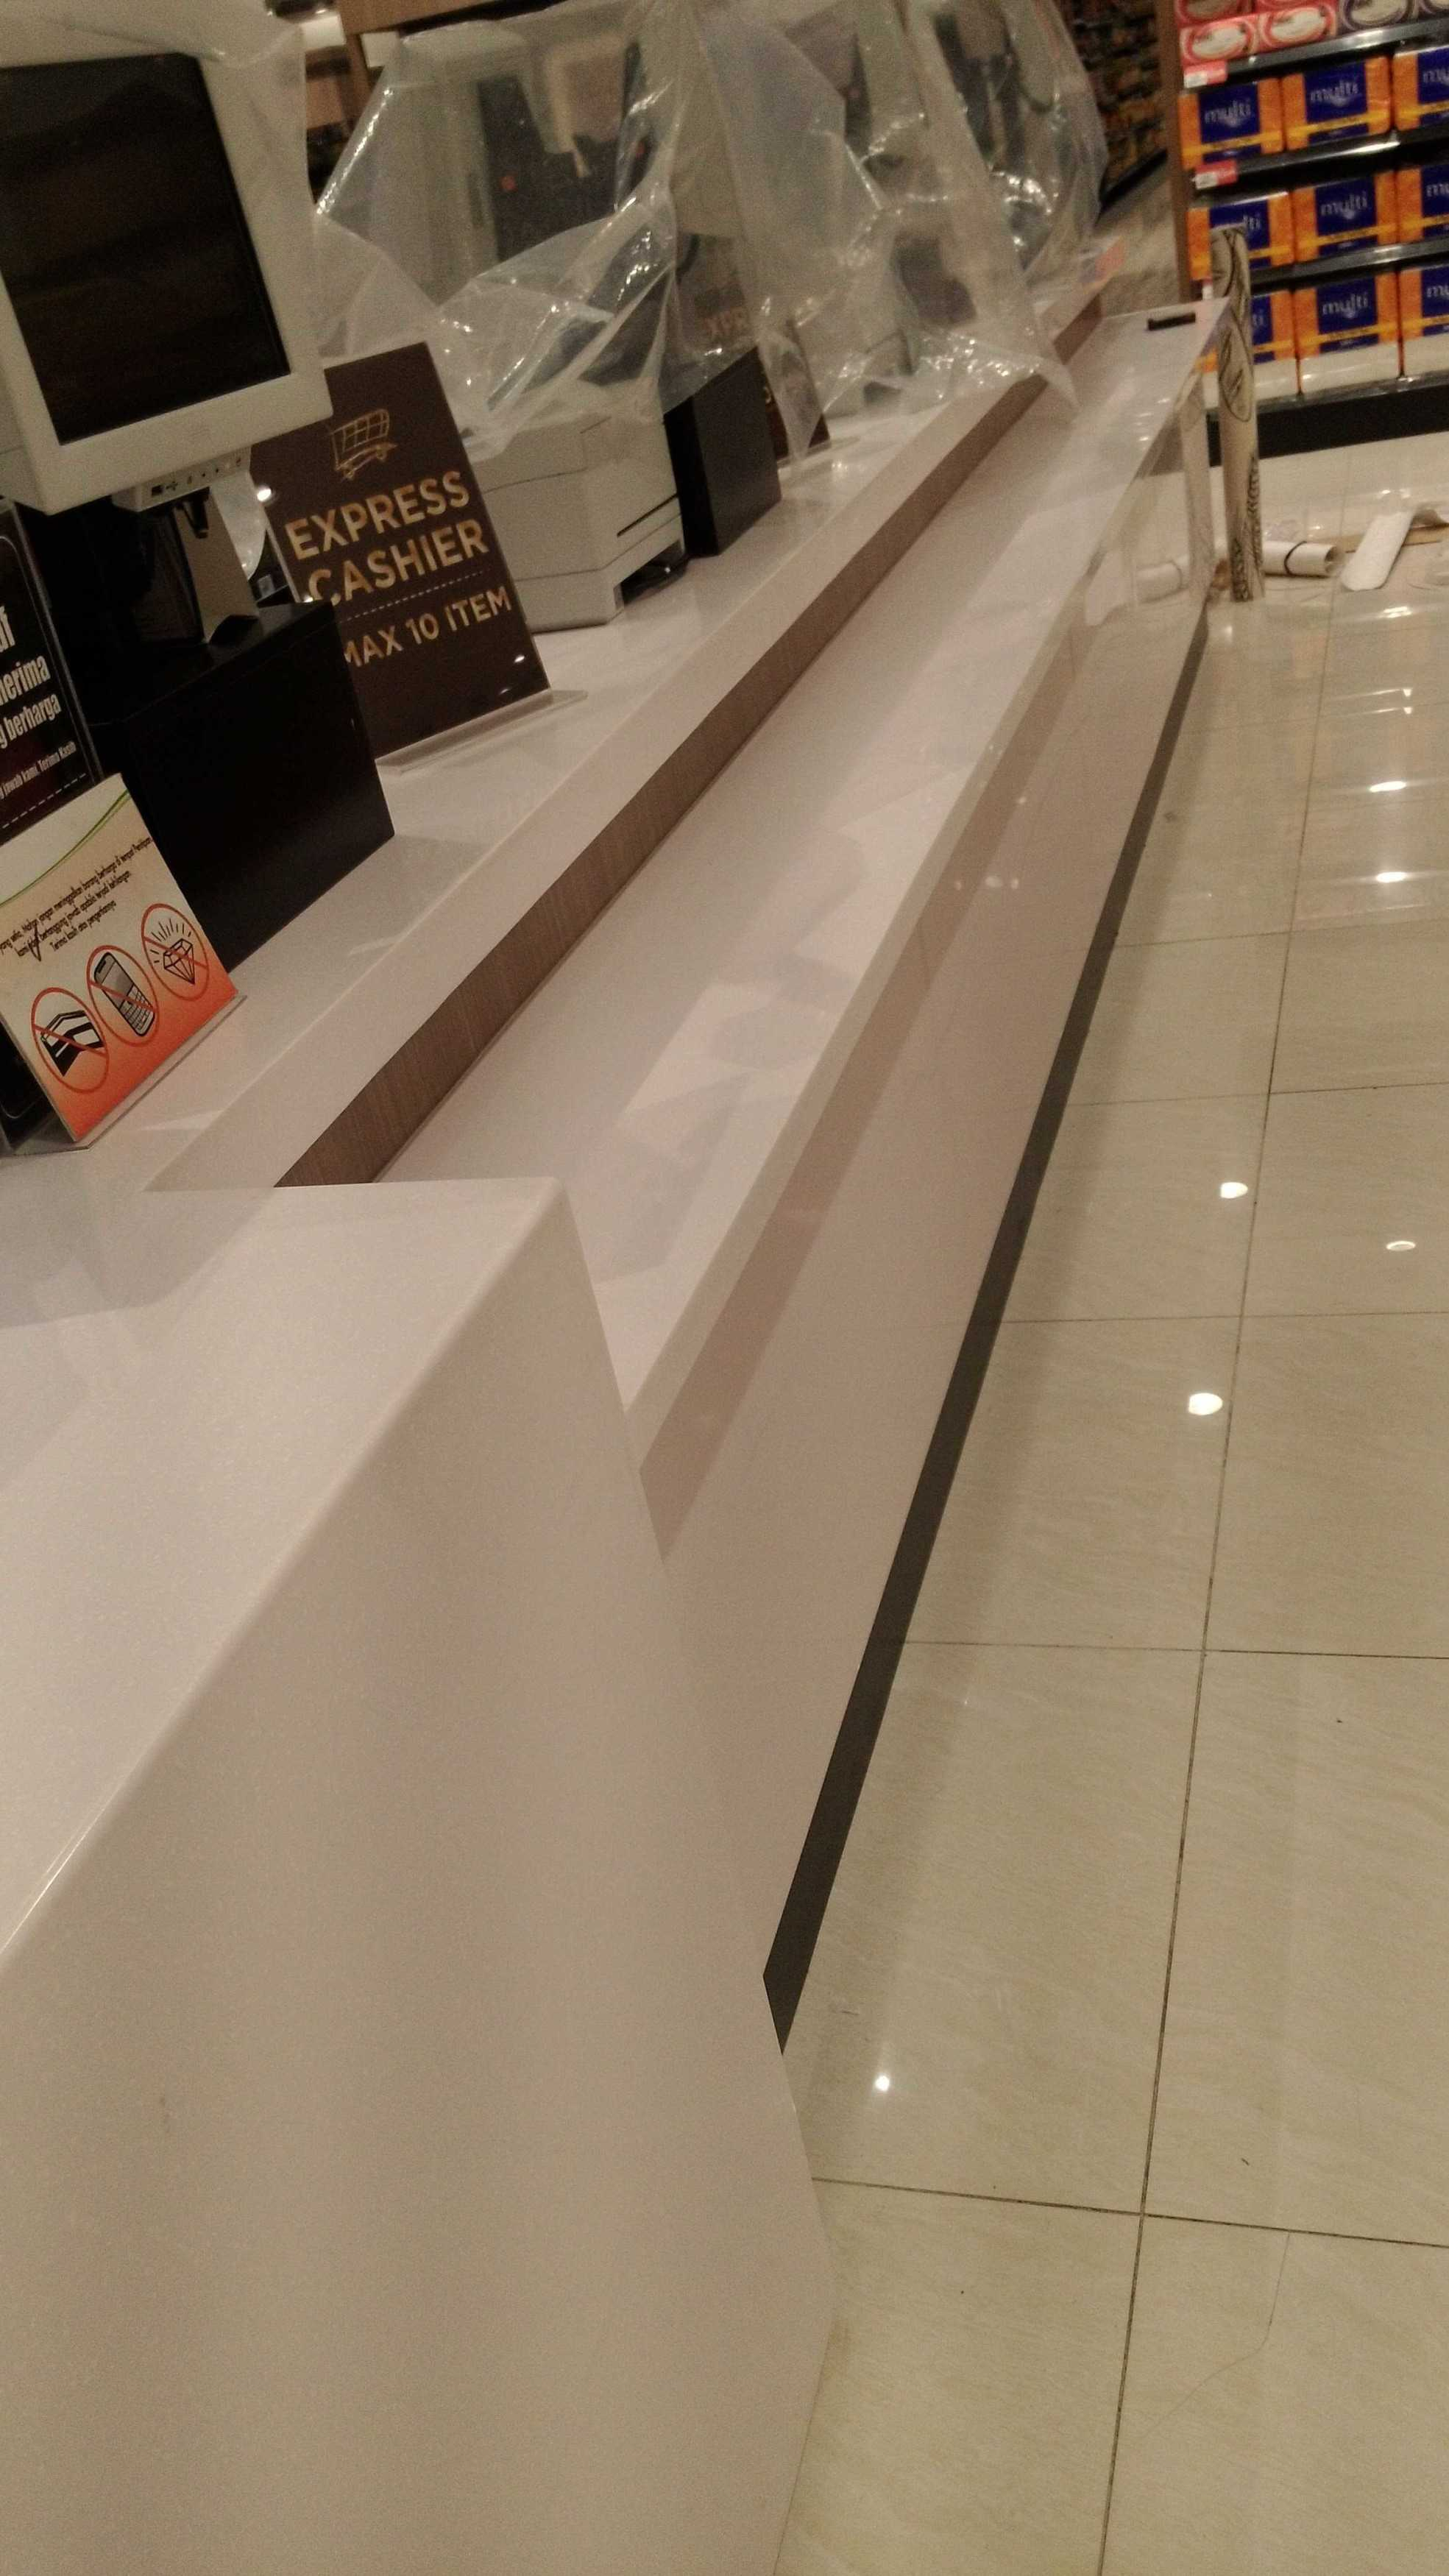 Aditio's Build And Design Hero Supermarket Jl. Metro Pondok Indah, Pd. Pinang, Kby. Lama, Kota Jakarta Selatan, Daerah Khusus Ibukota Jakarta 12310, Indonesia Jl. Metro Pondok Indah, Pd. Pinang, Kby. Lama, Kota Jakarta Selatan, Daerah Khusus Ibukota Jakarta 12310, Indonesia P20161122000216 Industrial  36516